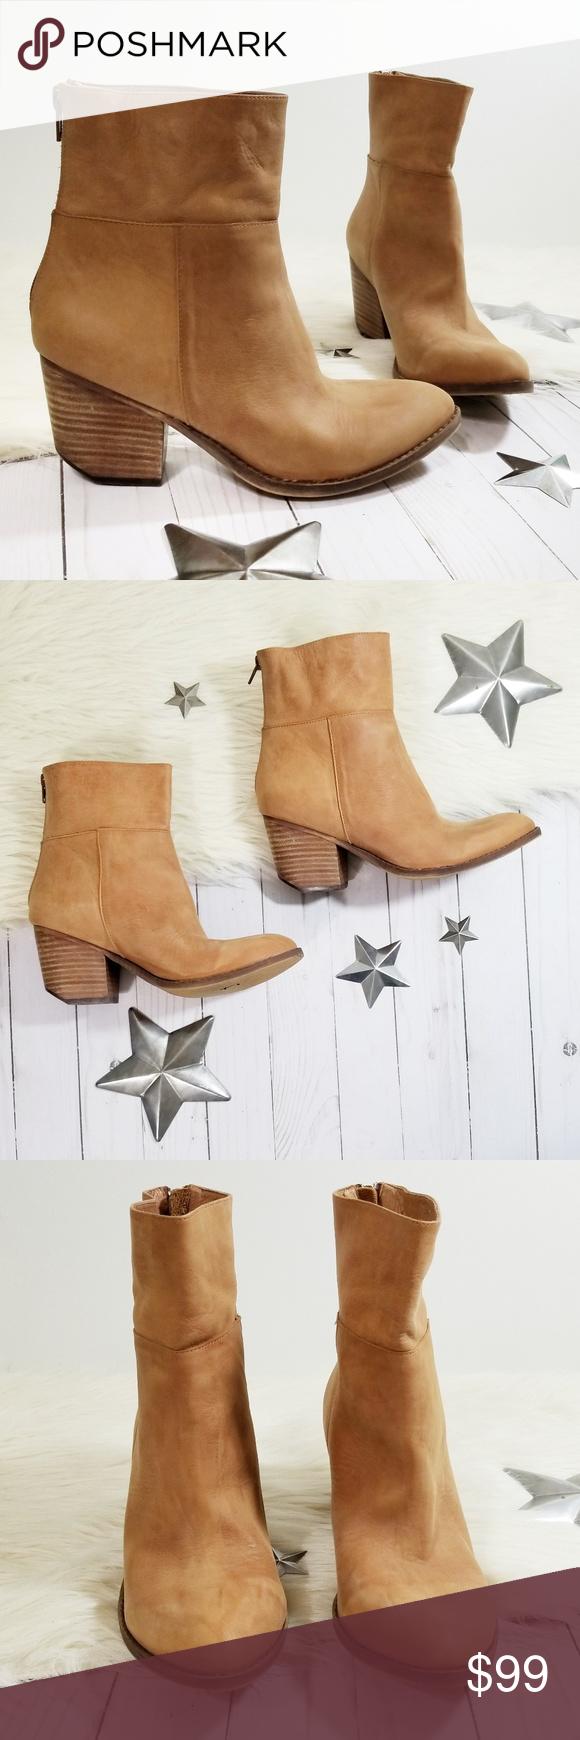 368766235ff03 Jeffrey Campbell Ibiza Rosmore Boots tan leather 8 Jeffrey Campbell Ibiza  Last series heeled ankle boots